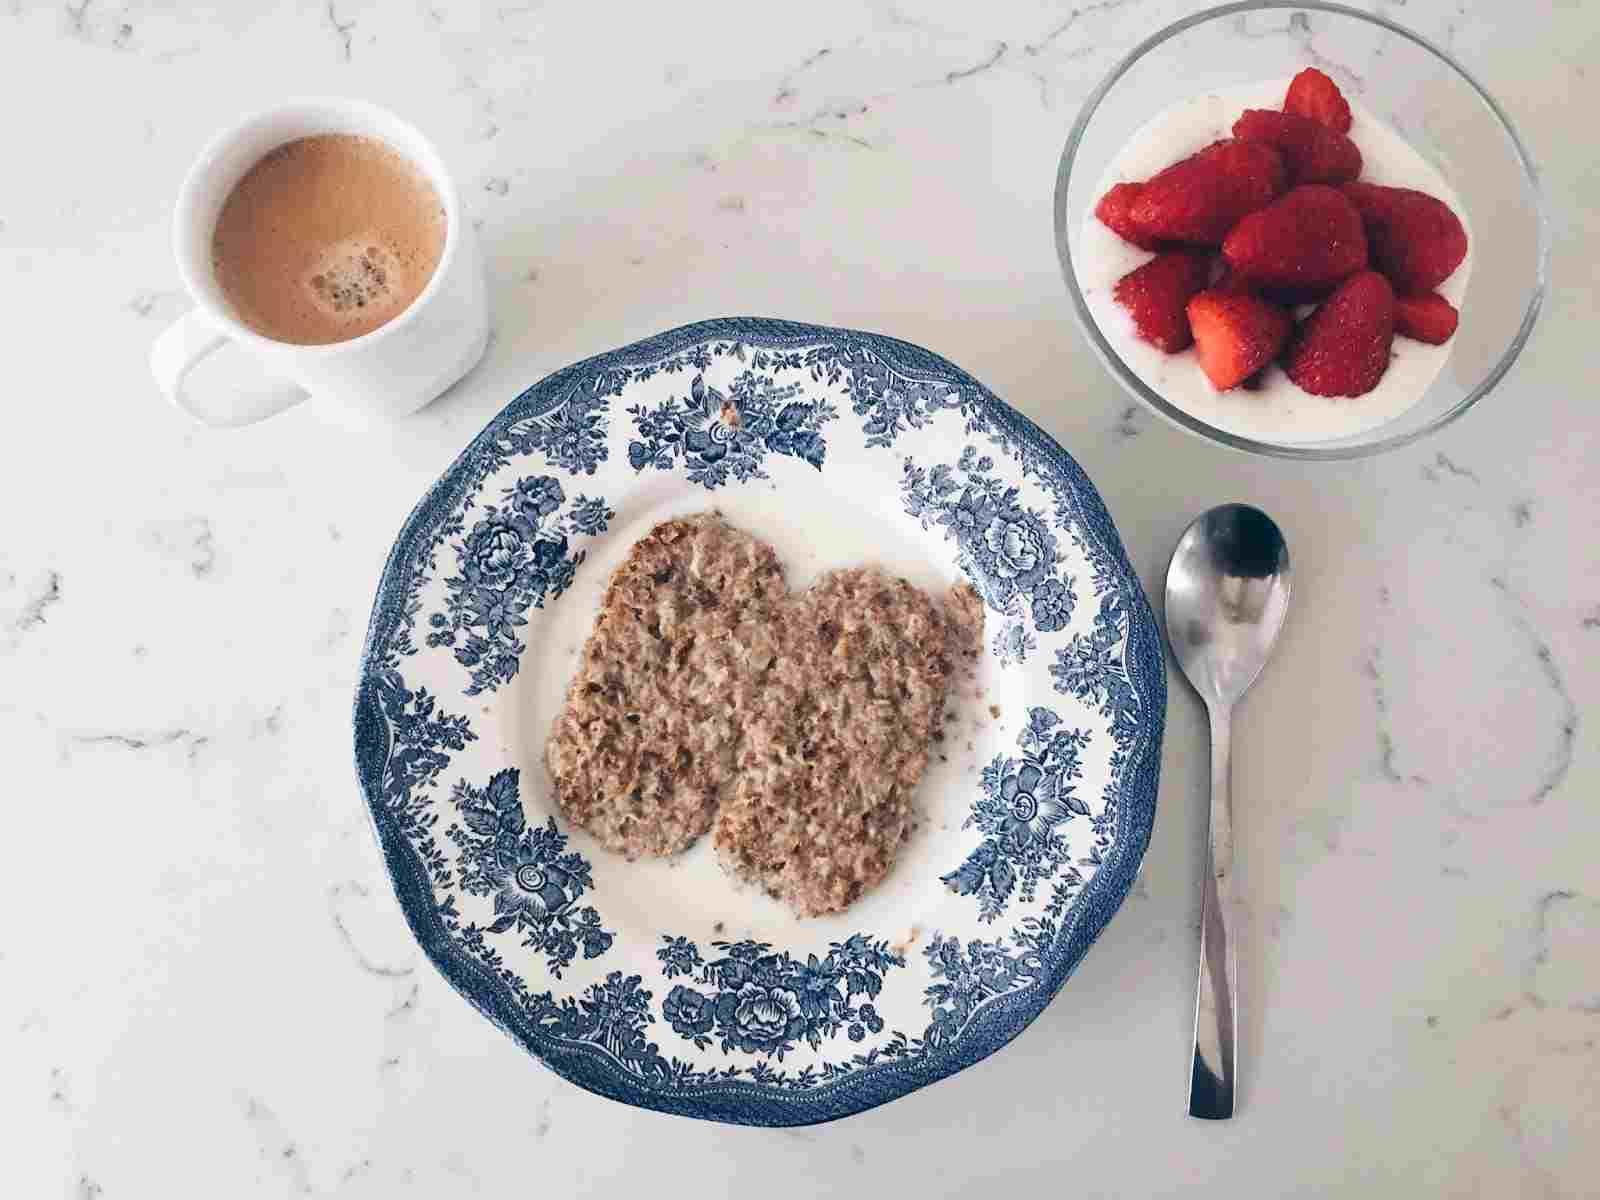 Weetabix and fruit strawberries